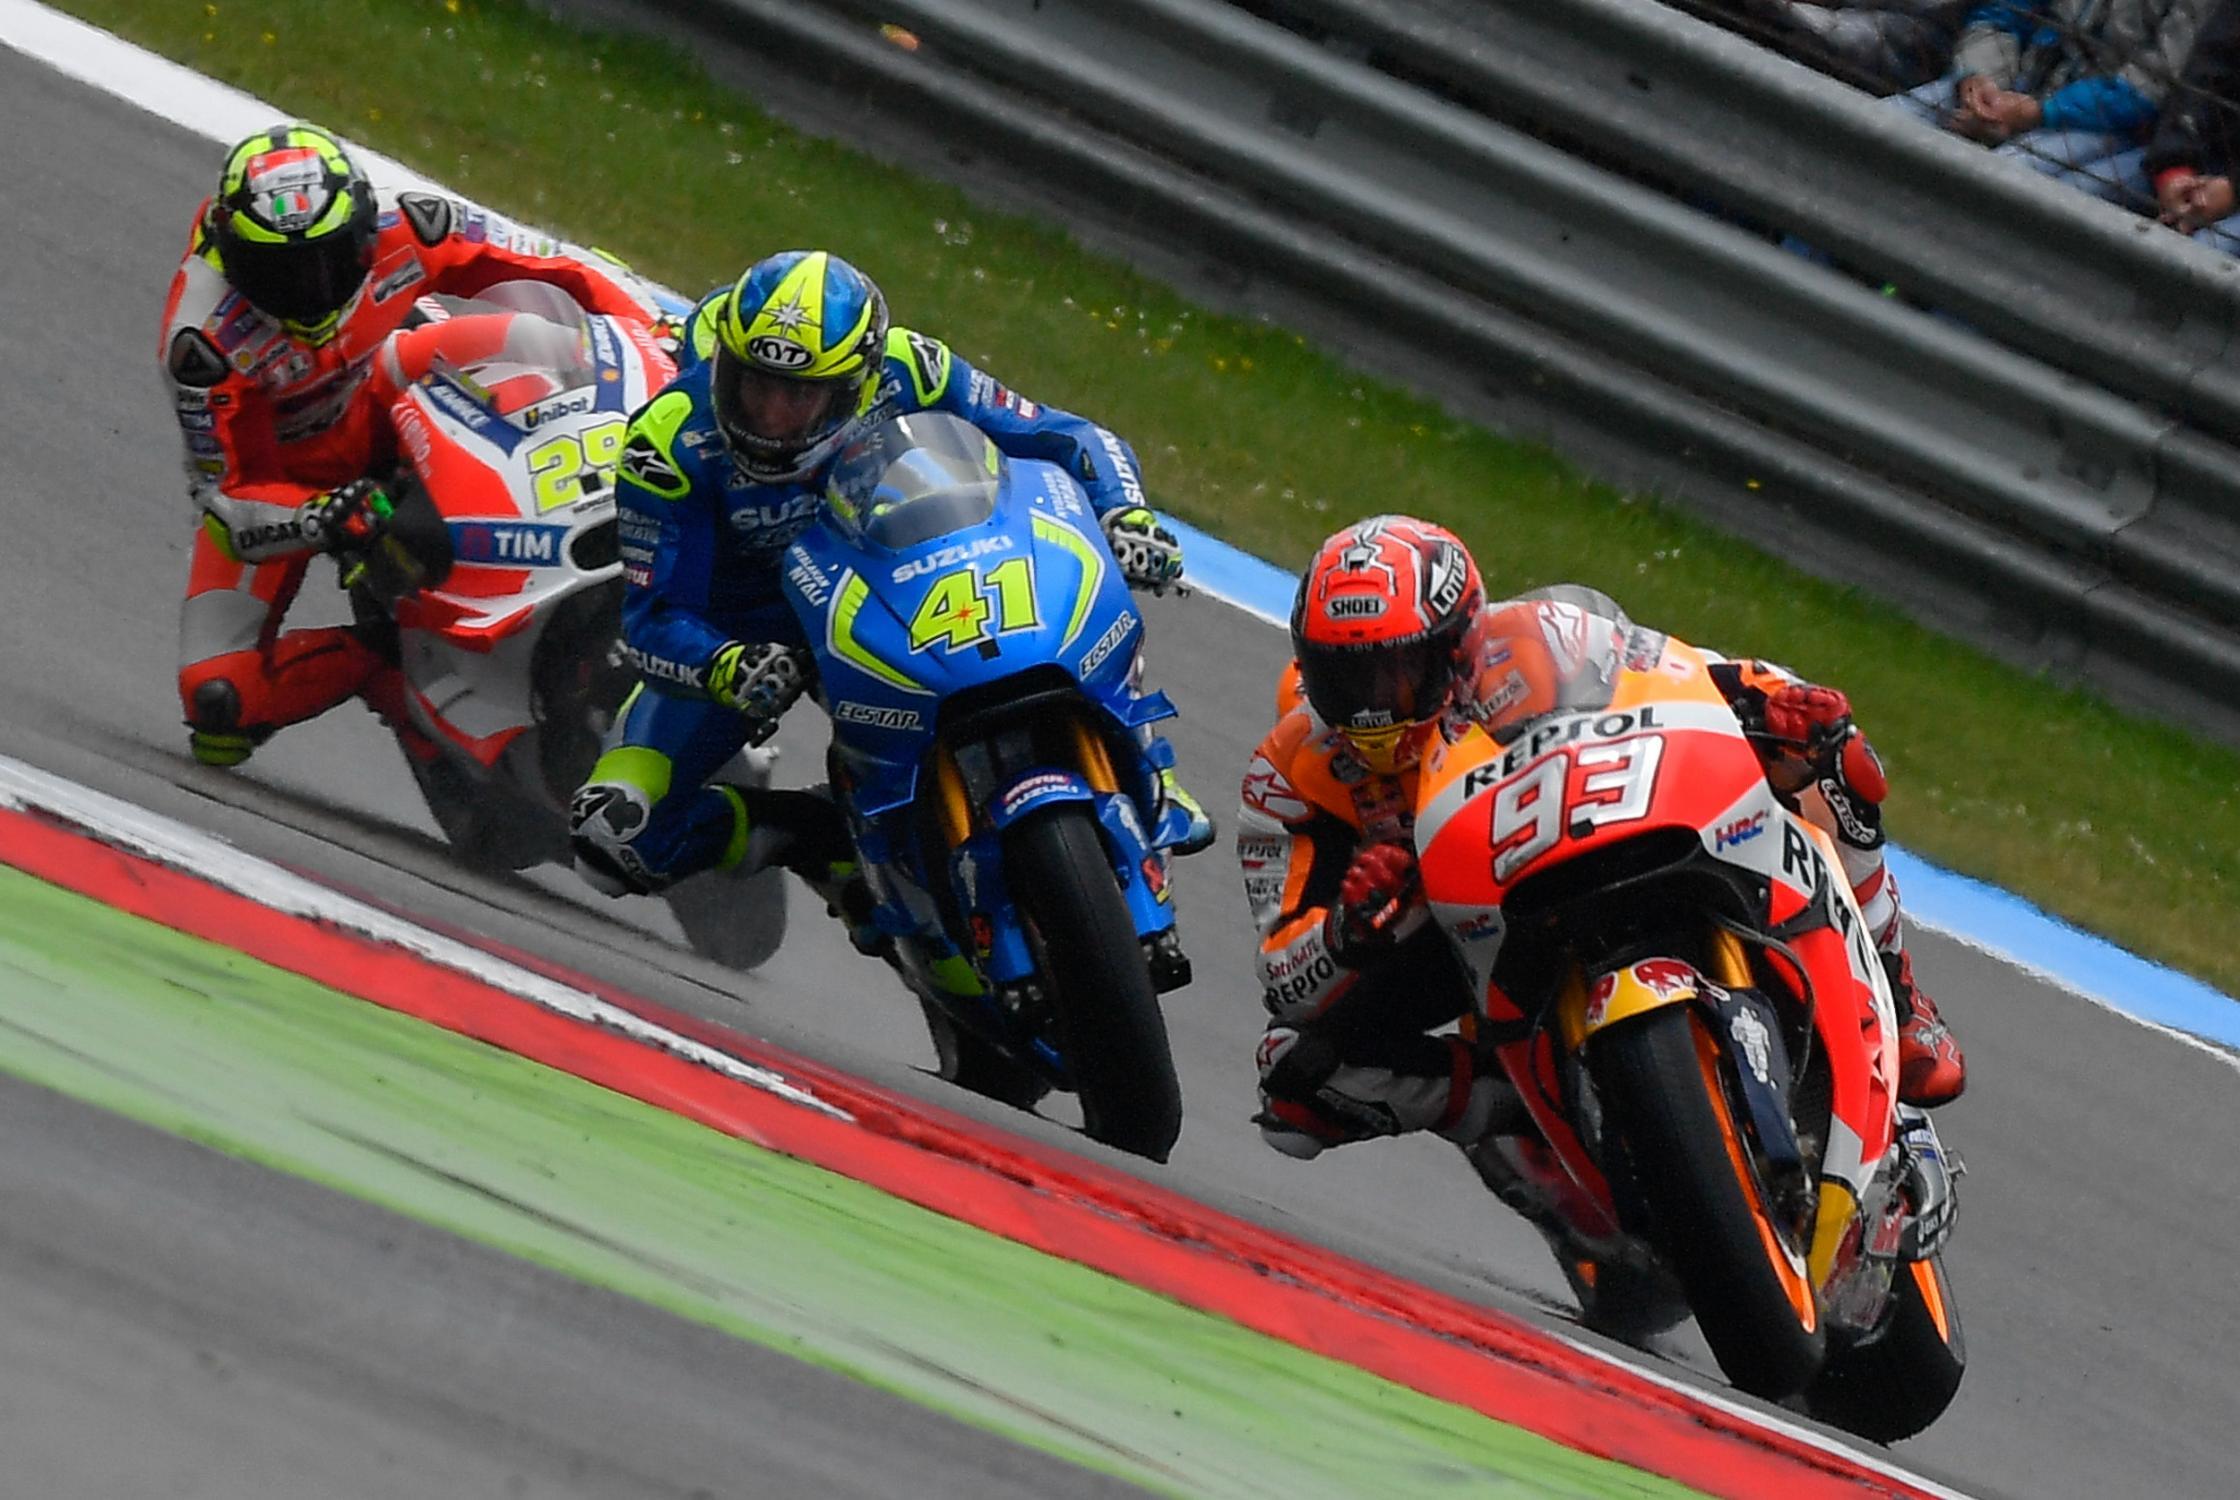 2018-MotoGP-Motul-TT-Assen-best-MotoGP-race_16